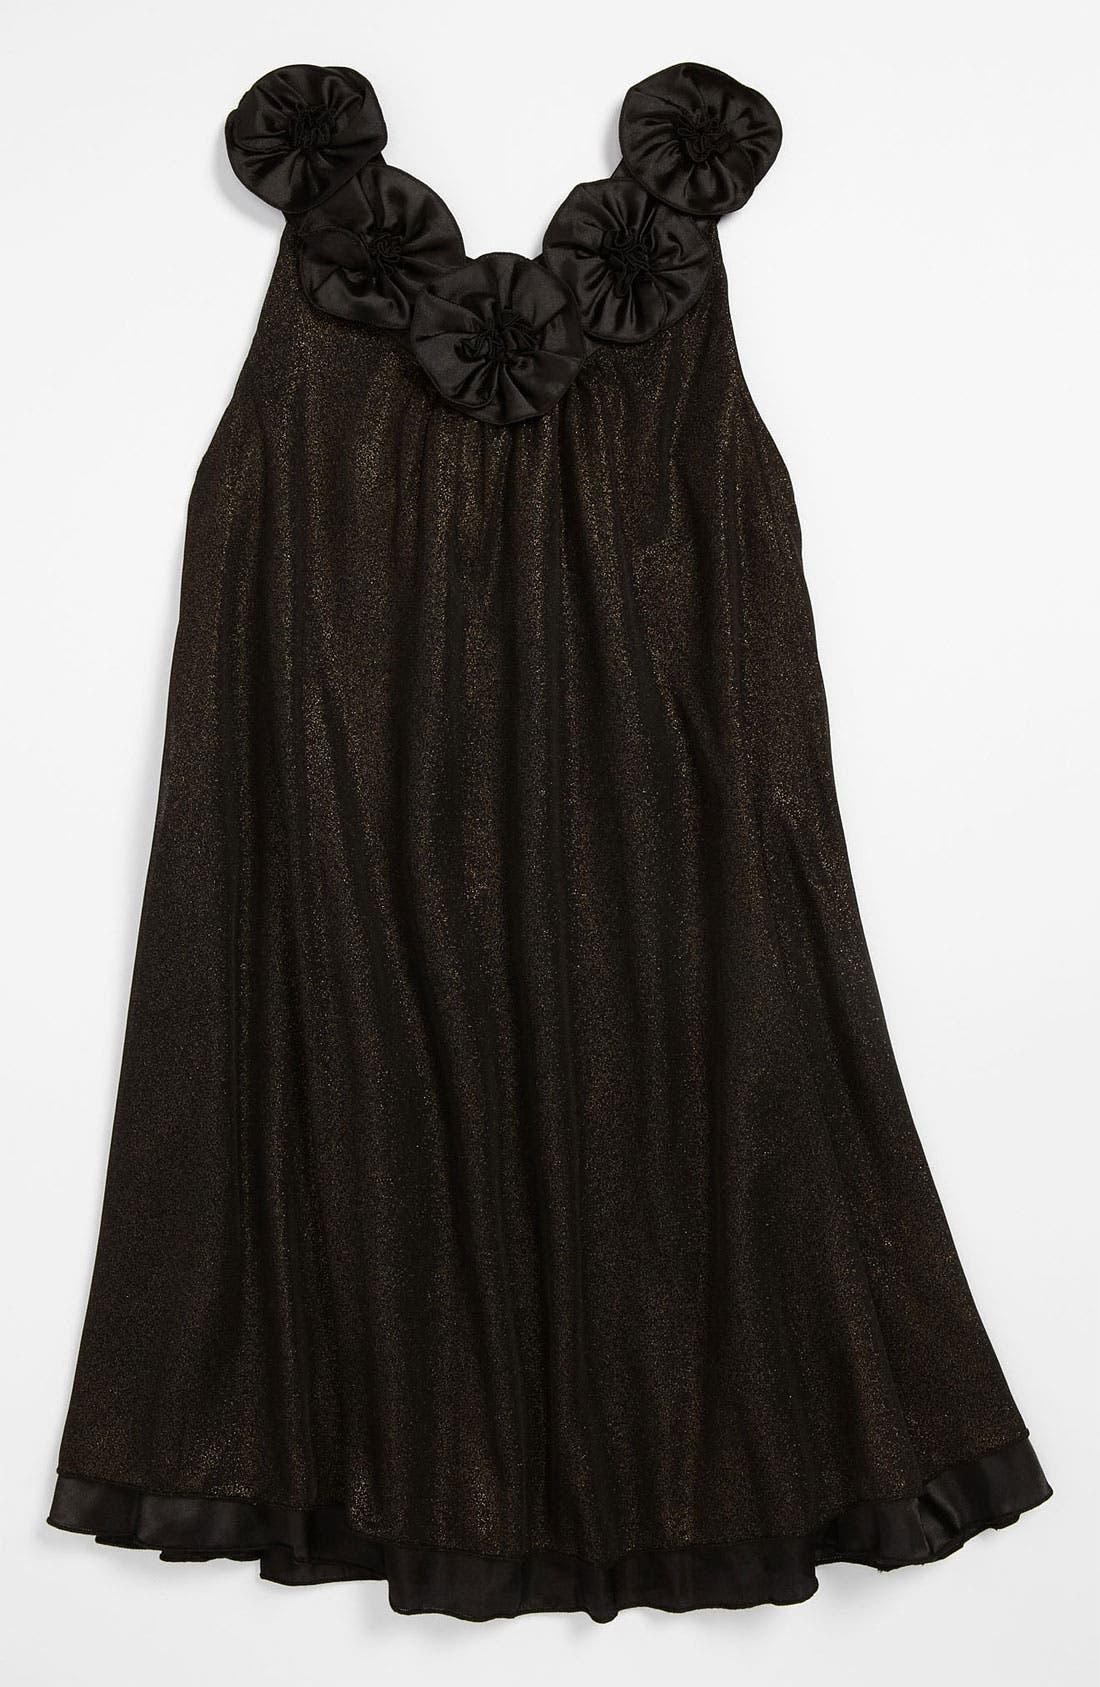 Main Image - Laundry by Shelli Segal 'Diana' Glitter Dress (Big Girls)